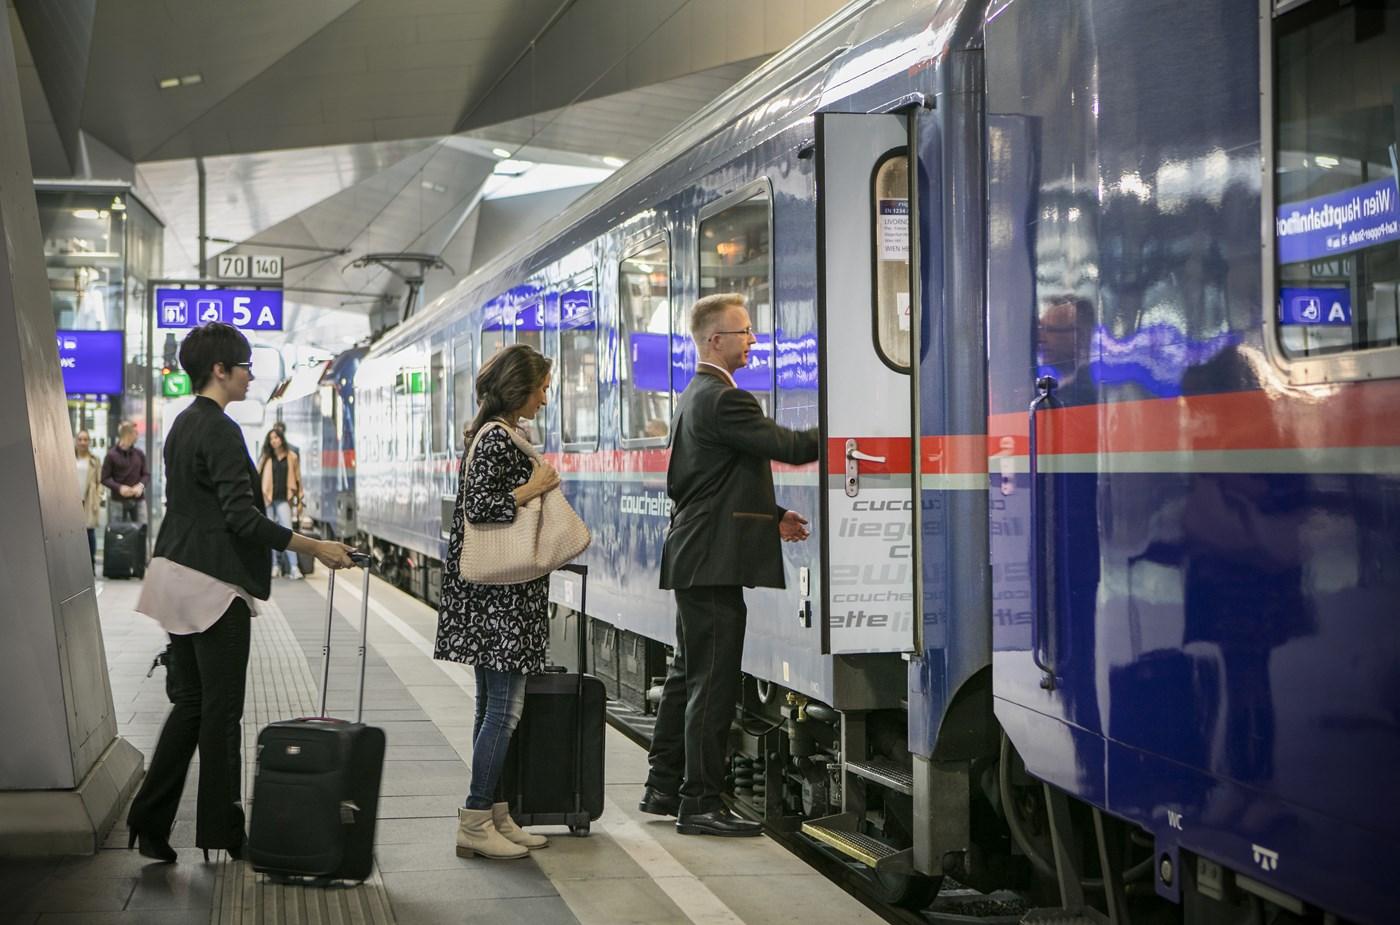 OBB Nightjet - Internationale treintickets